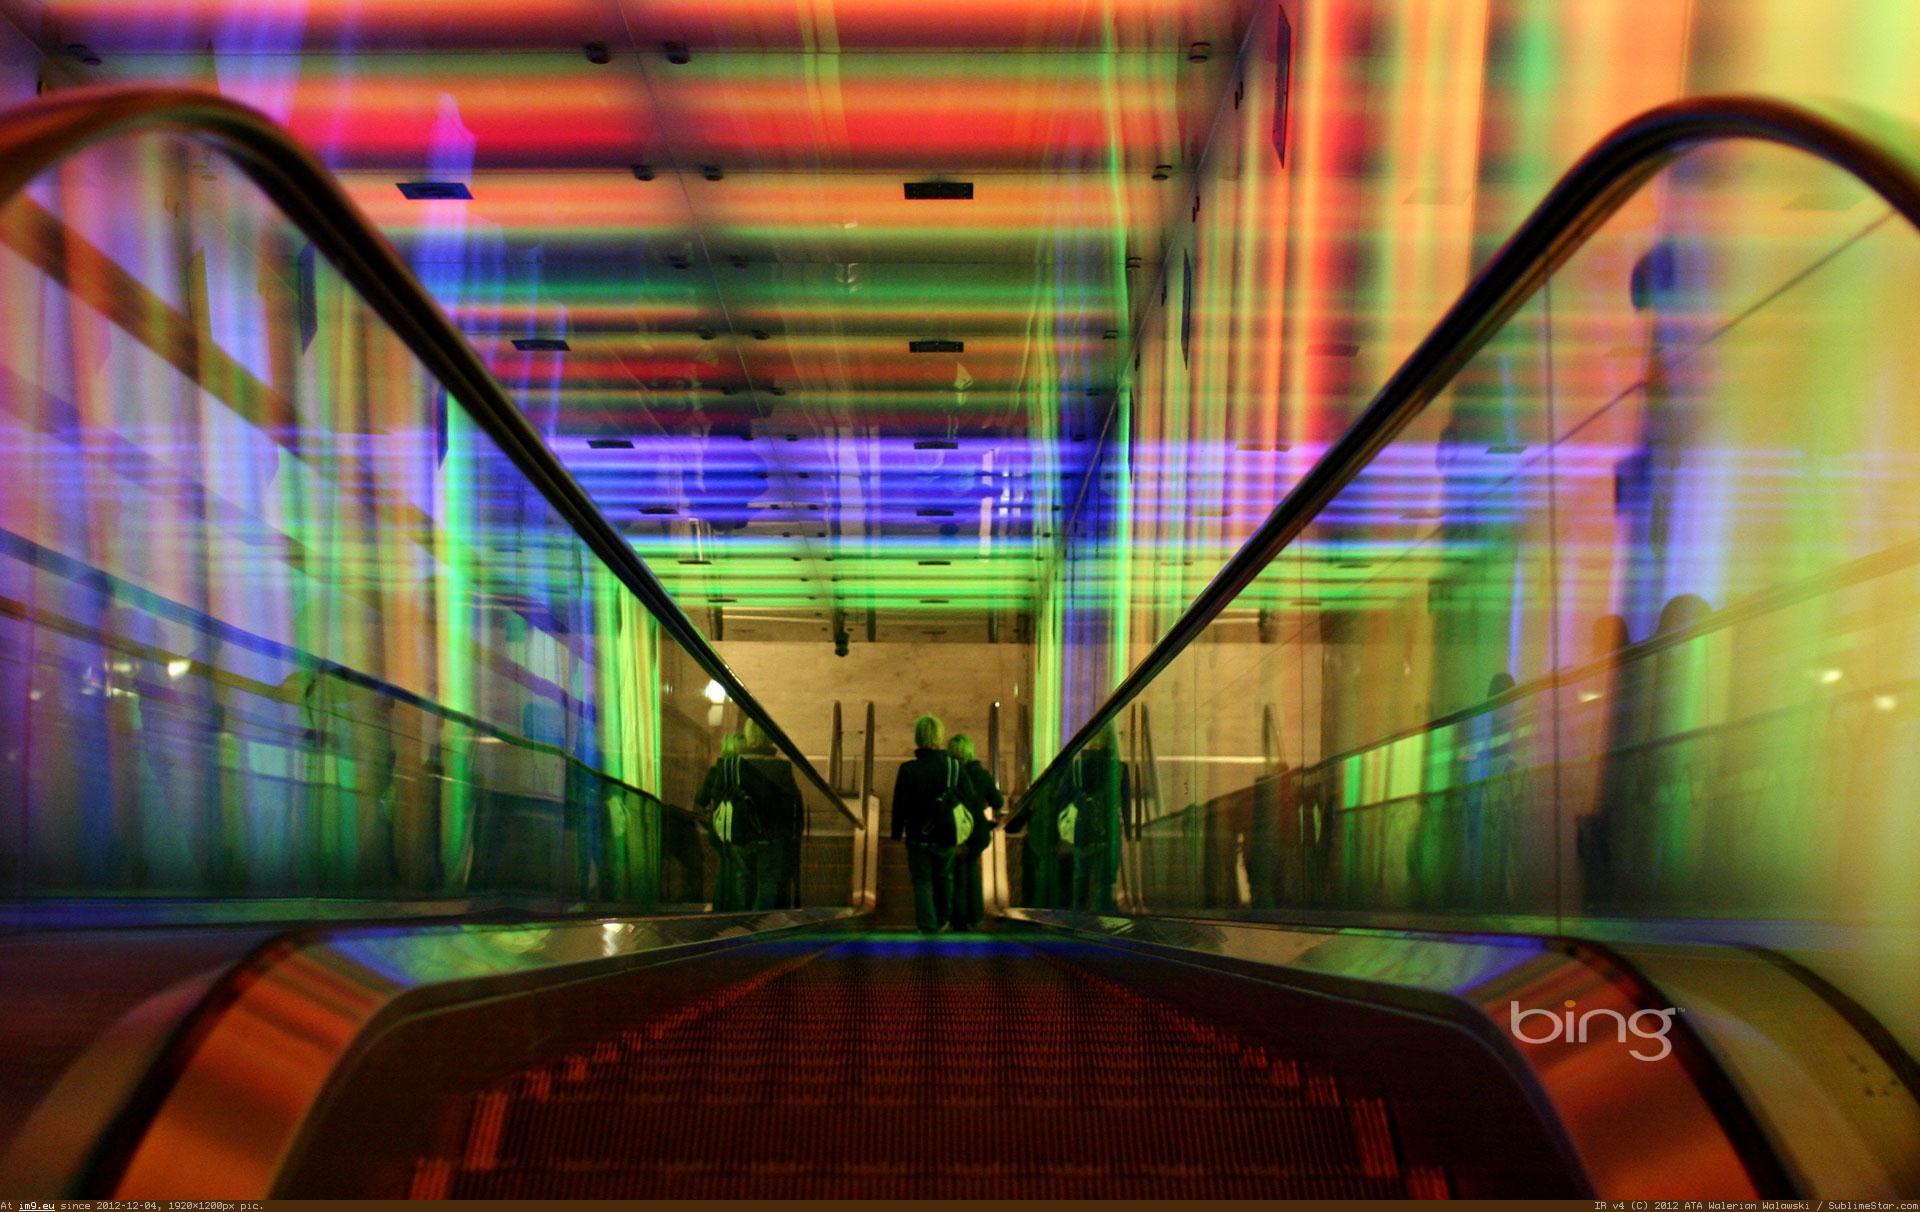 Youtube fashion 2017 - Light Design On Escalators Sees Inc